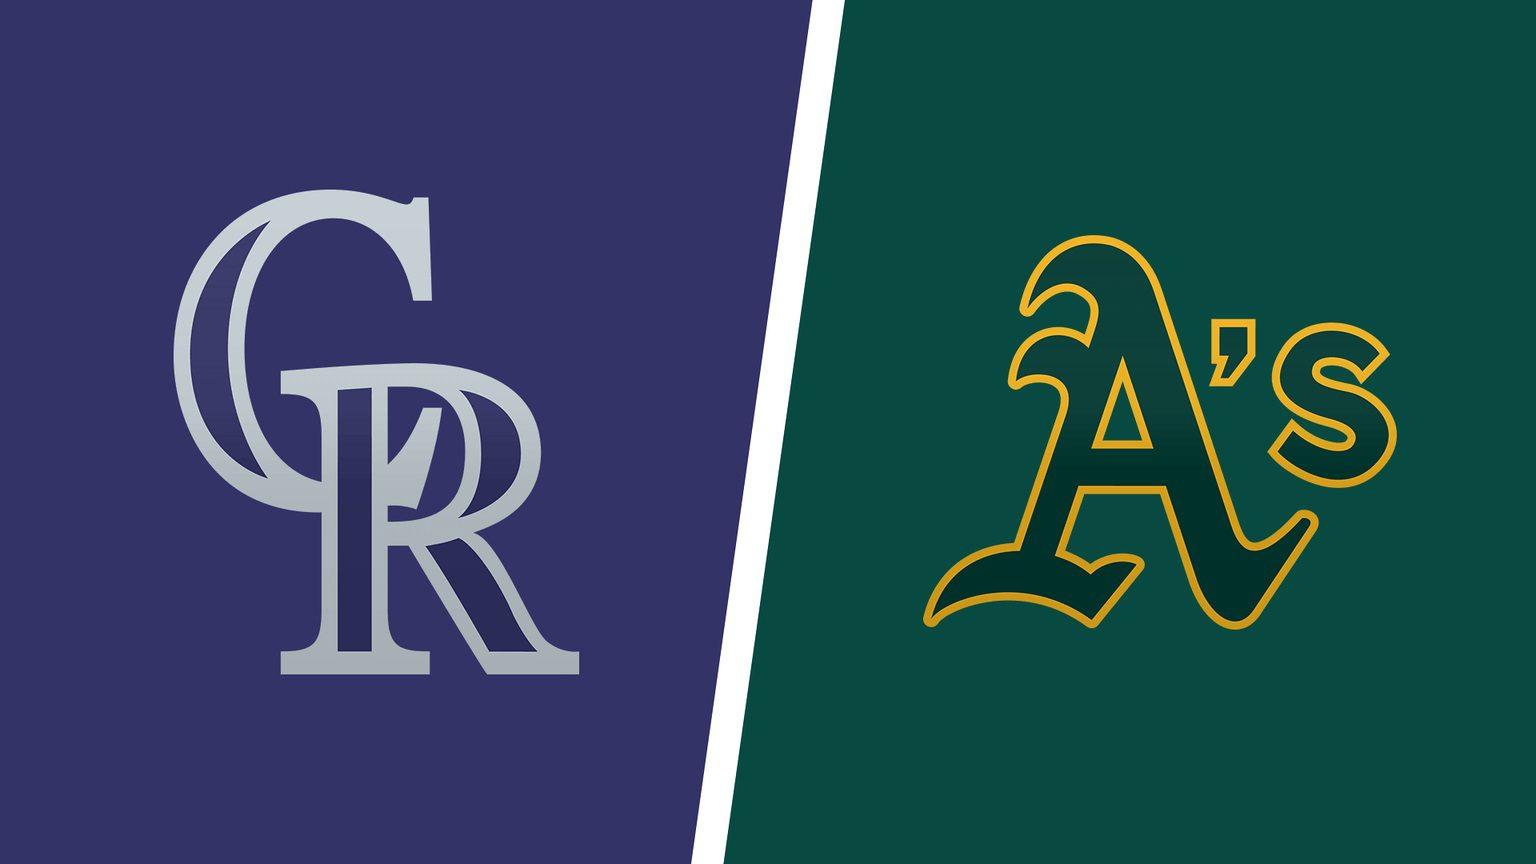 Oakland Athletics vs Colorado Rockies MLB Odds and Predictions